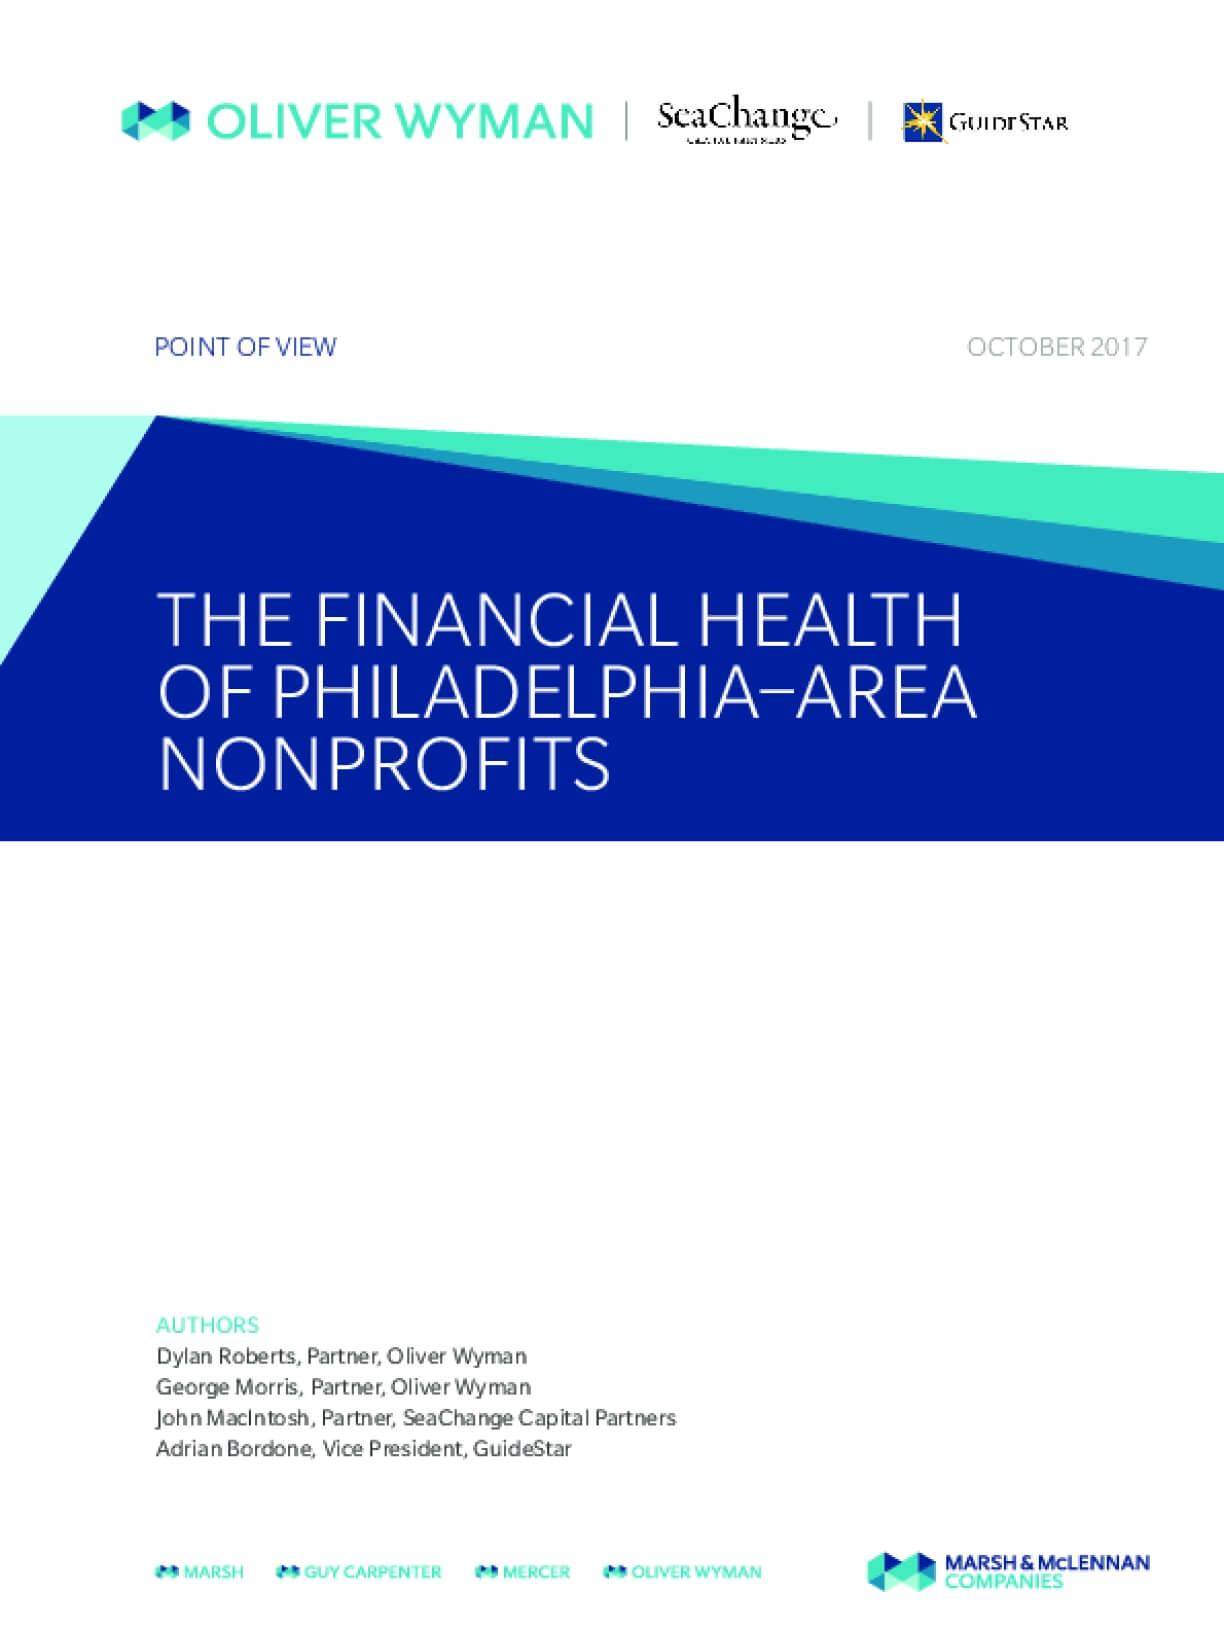 The Financial Health of Philadelphia-Area Nonprofits